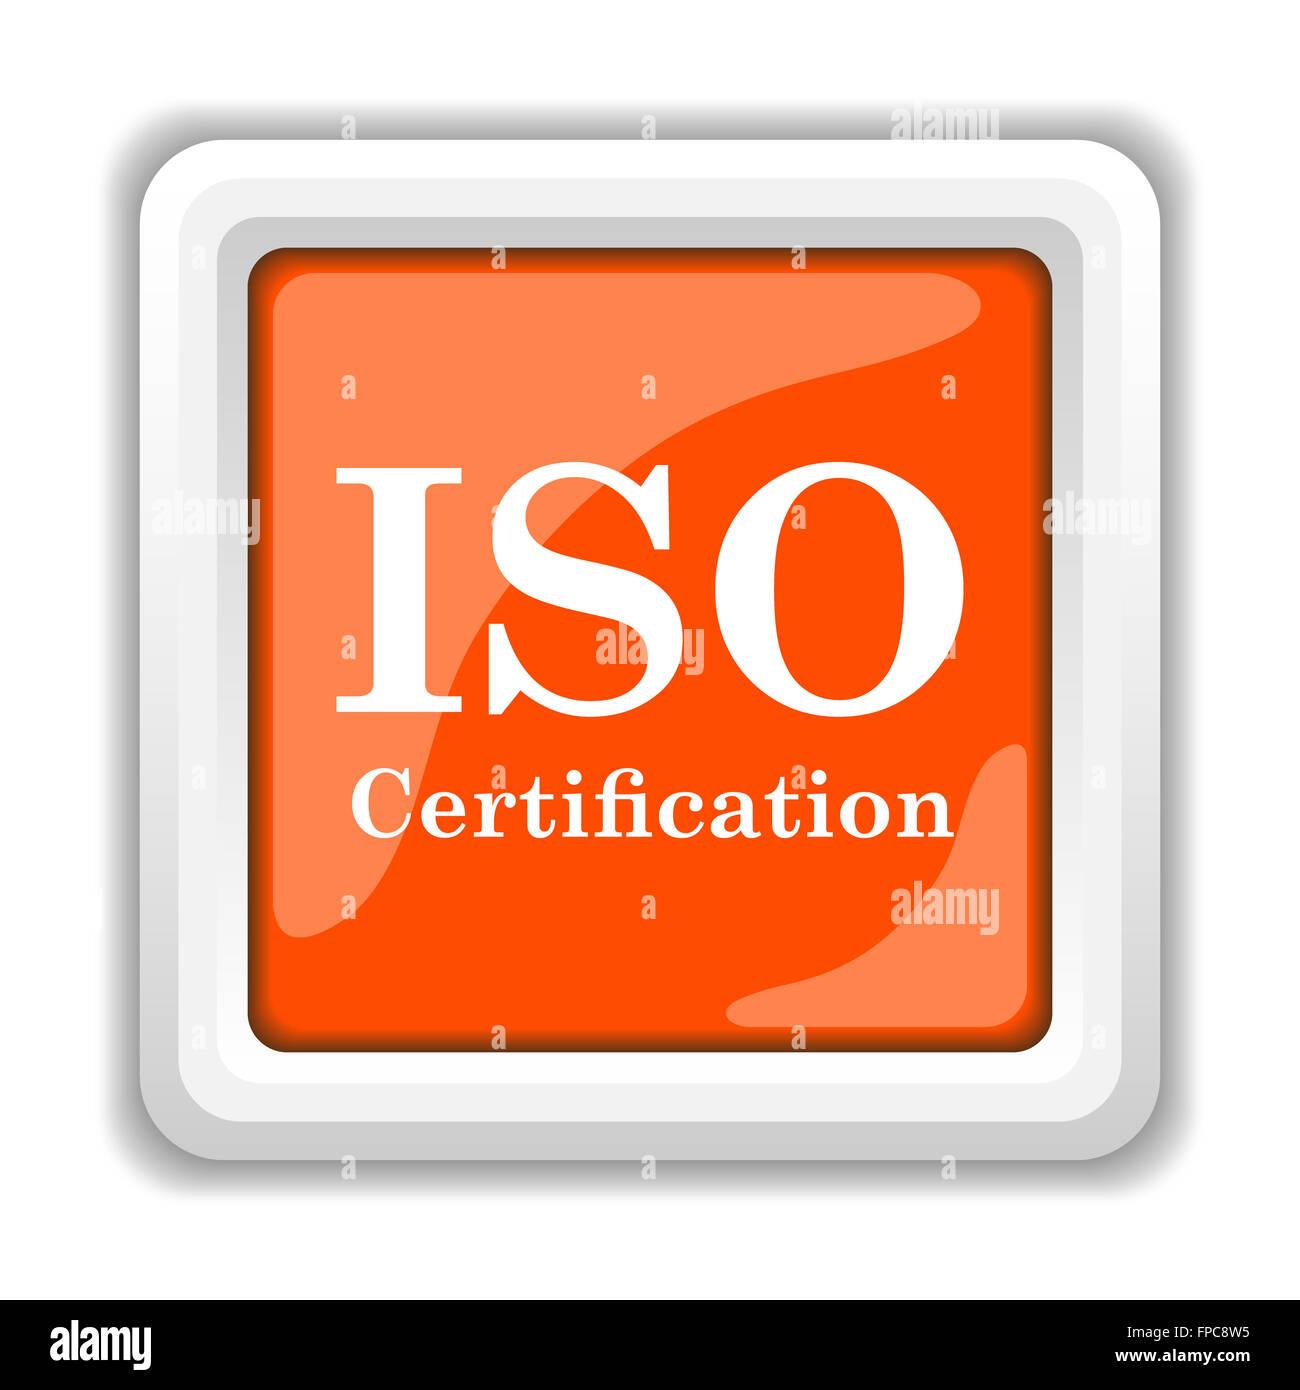 Iso Certification Icon Stock Photo 99844673 Alamy